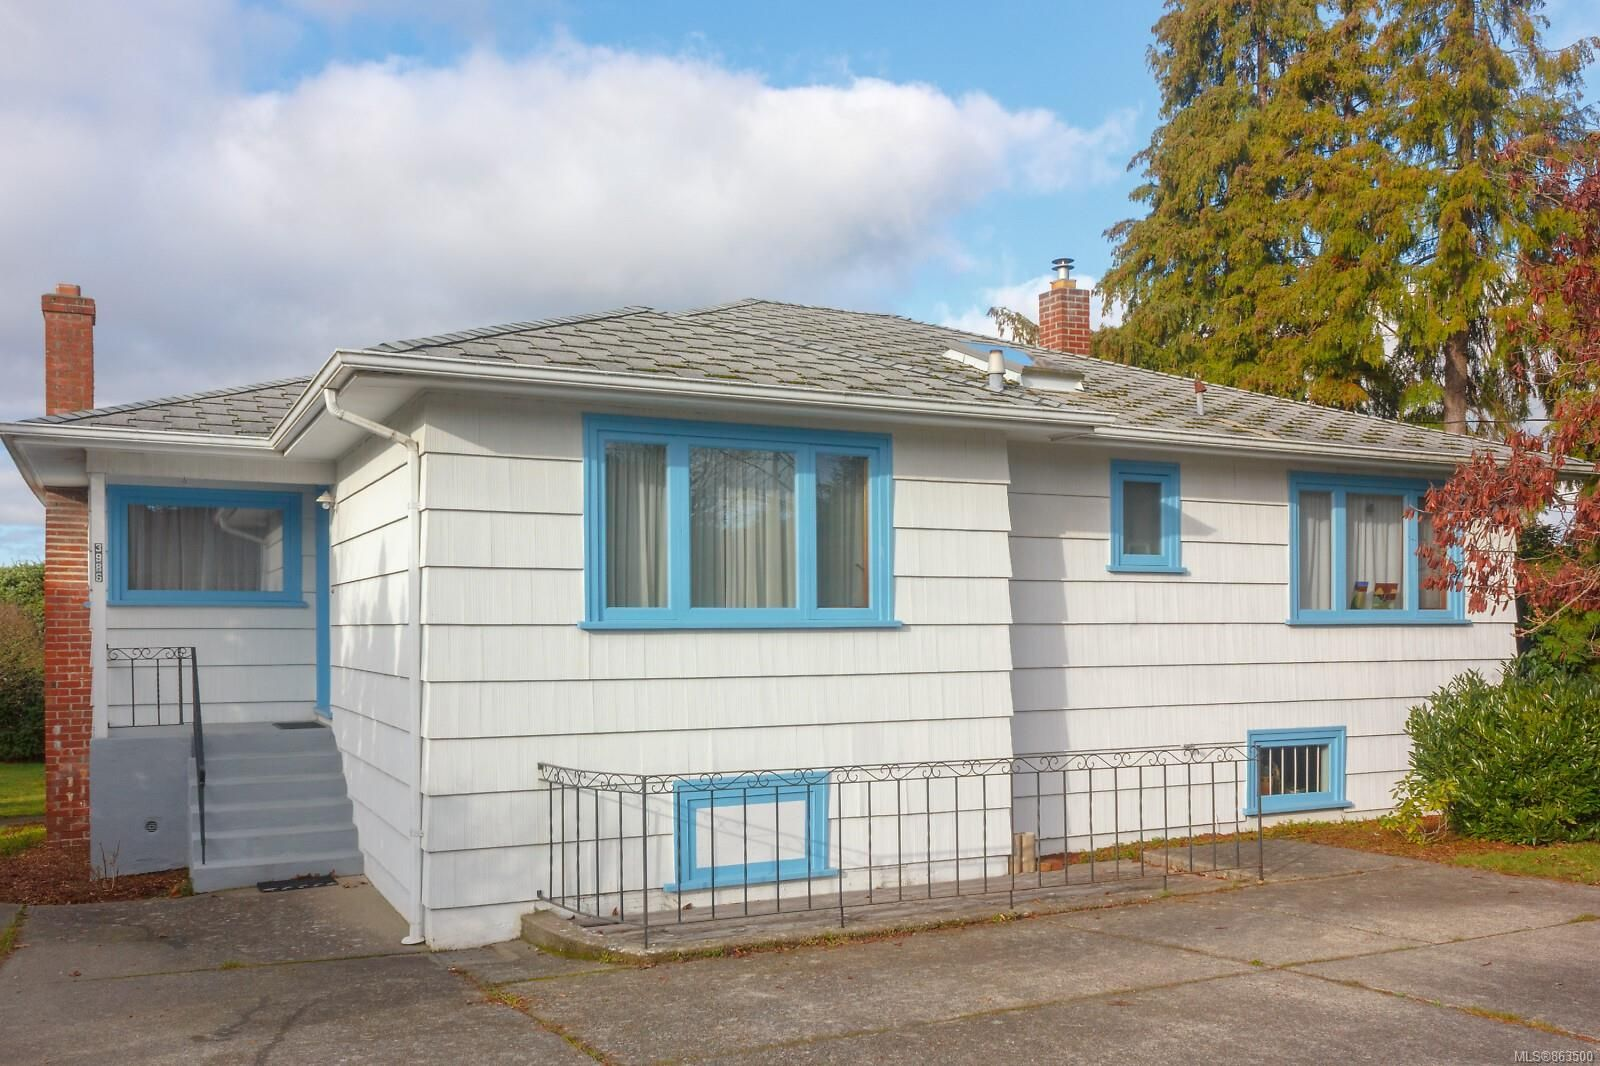 Main Photo: 3986 Gordon Head Rd in : SE Gordon Head House for sale (Saanich East)  : MLS®# 863500